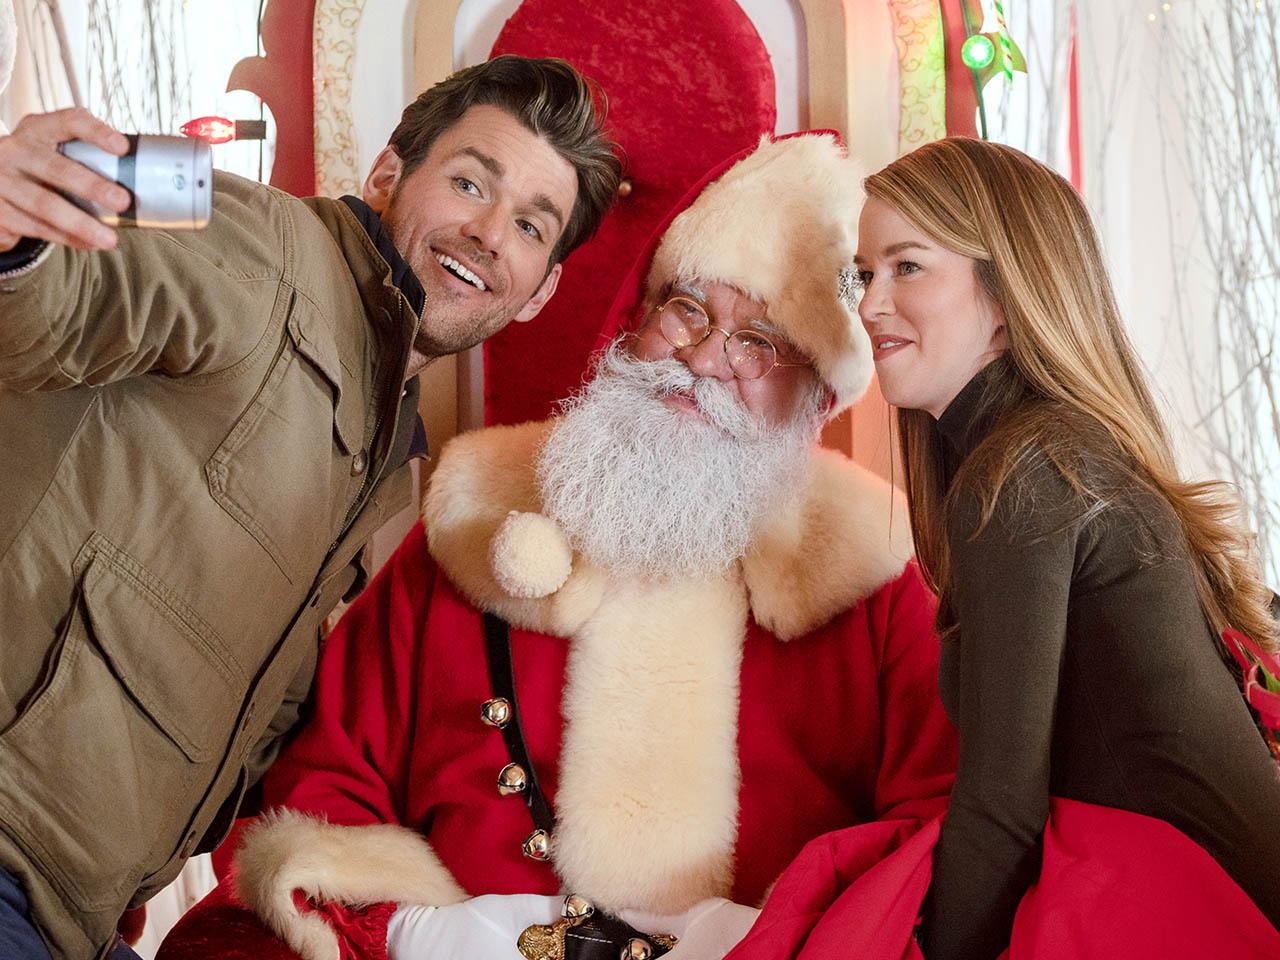 Hallmark Christmas Movies - A Christmas Scavenger Hunt - Johnson Production Group - Crown Media - 1280 - Featured - 01